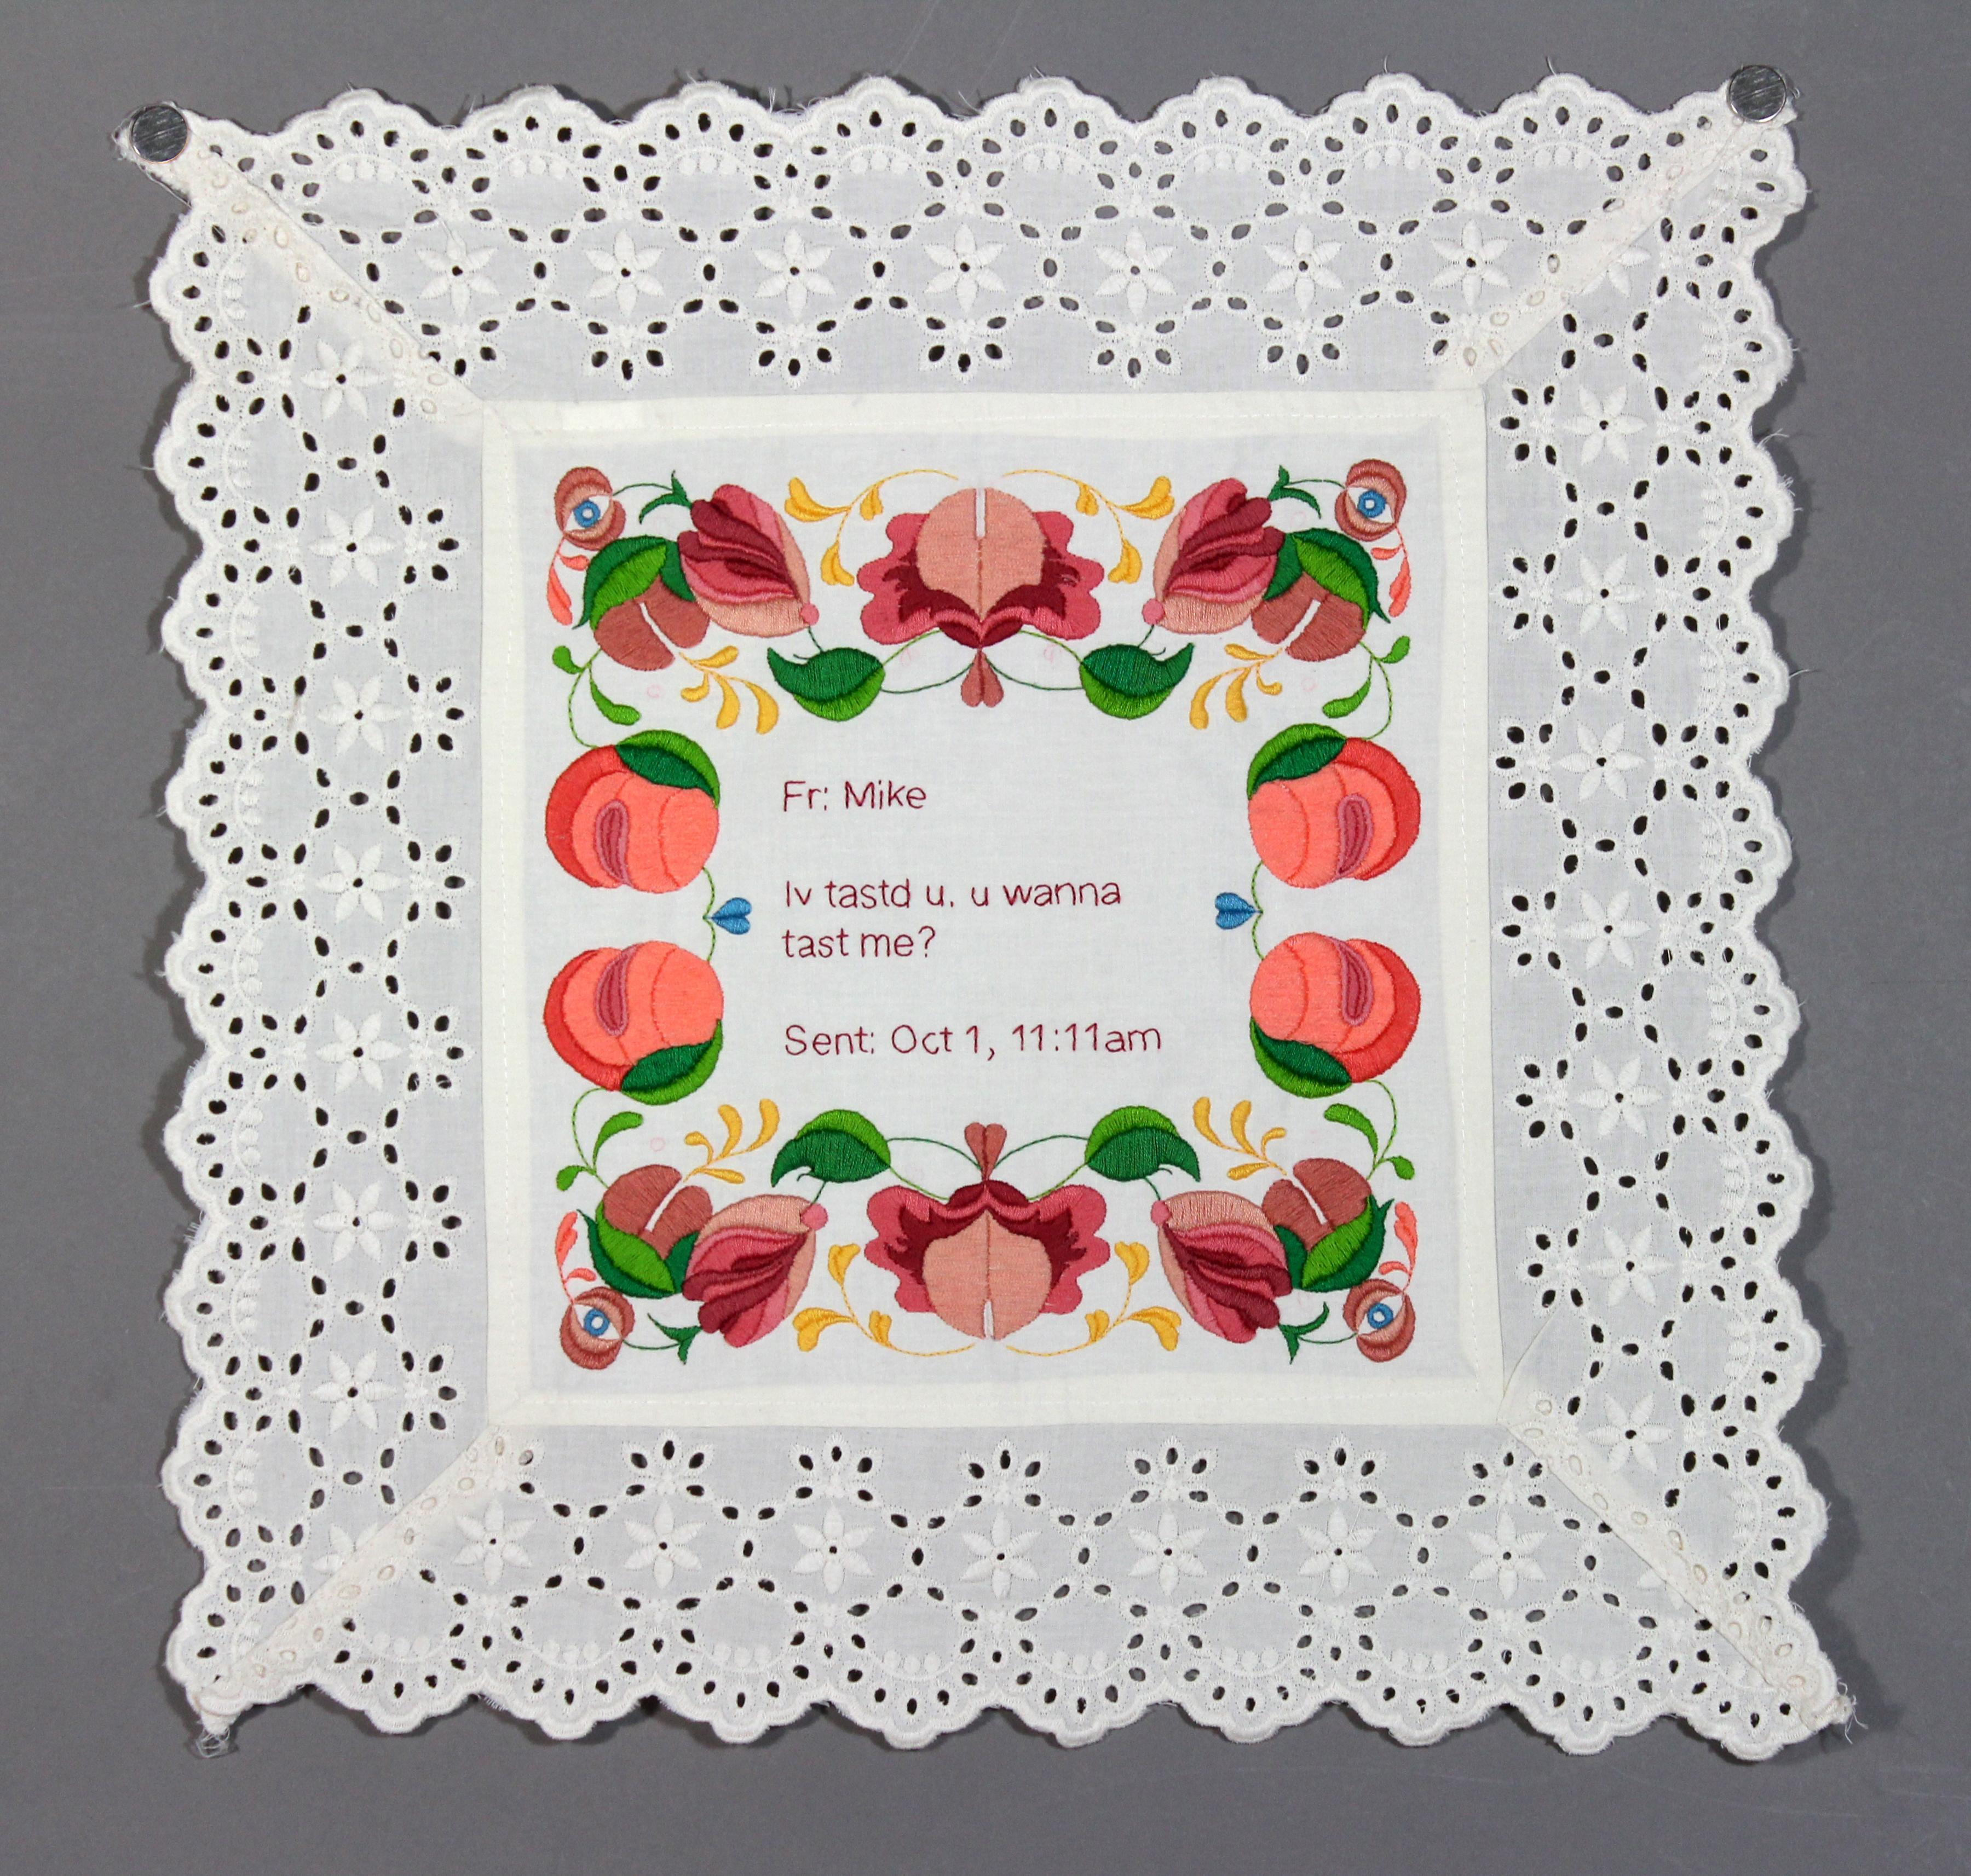 Kathyrn Shinko - Dirty Sampler Series - iv tastd u - hand embroidery on cloth (2014)